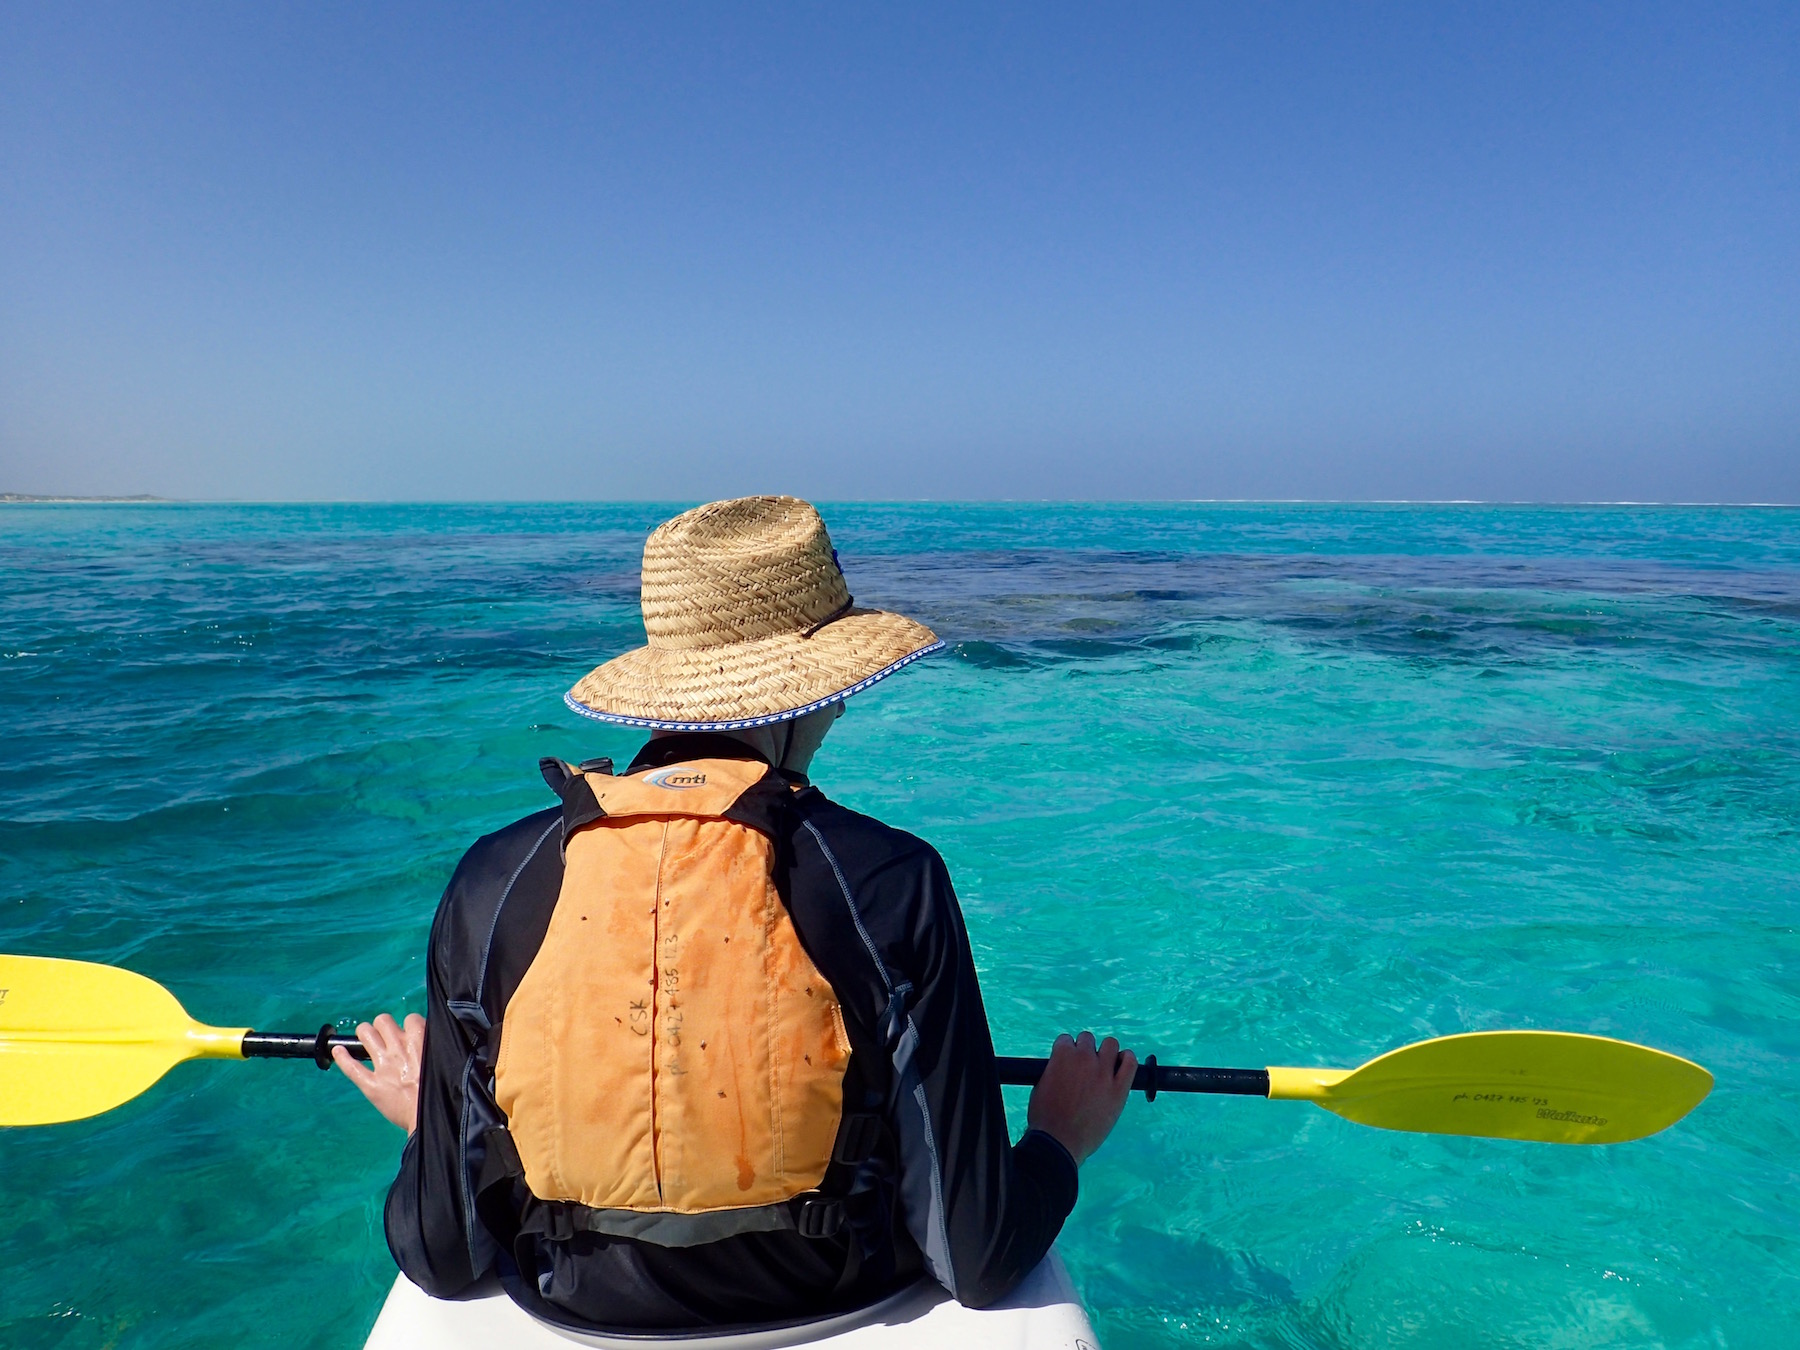 Lagoon Explorer, sea kayak, snorkel, eco tour, Exmouth Adventure Co, Exmouth, Western Australia, Ningaloo Reef, Coral Coast, Cape Range National Park